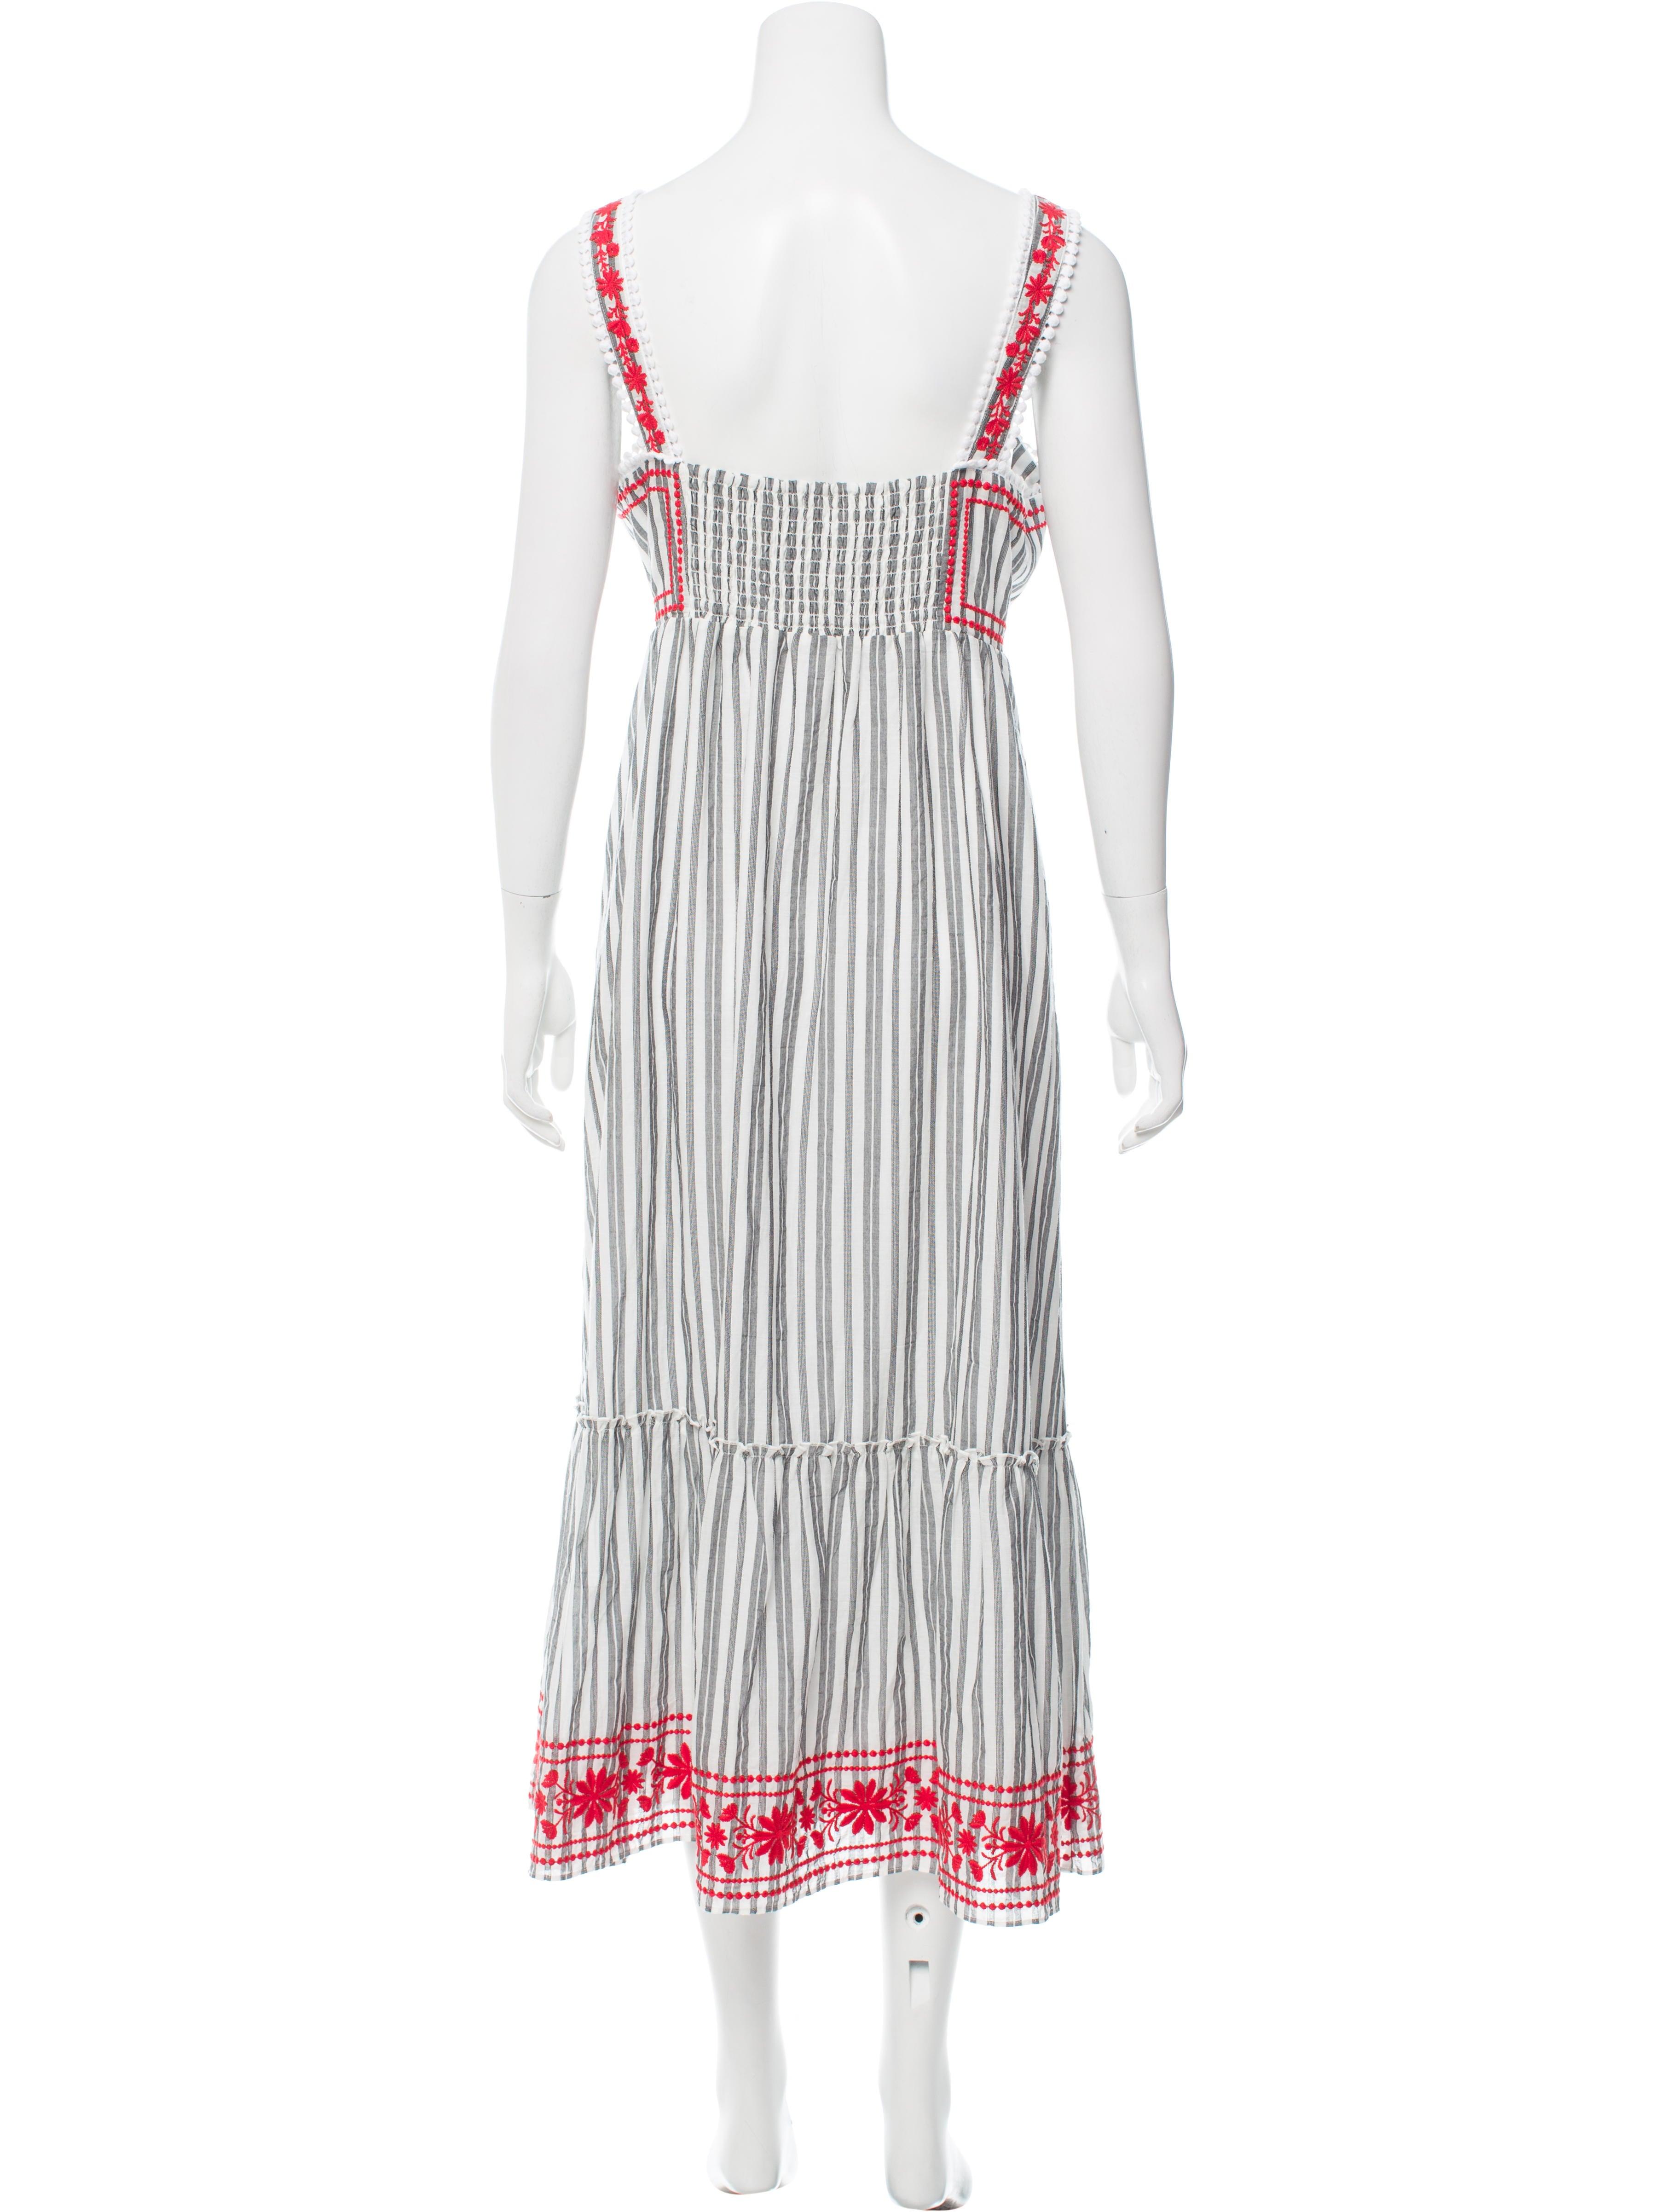 Kate Spade New York Sleeveless Printed Dress Clothing